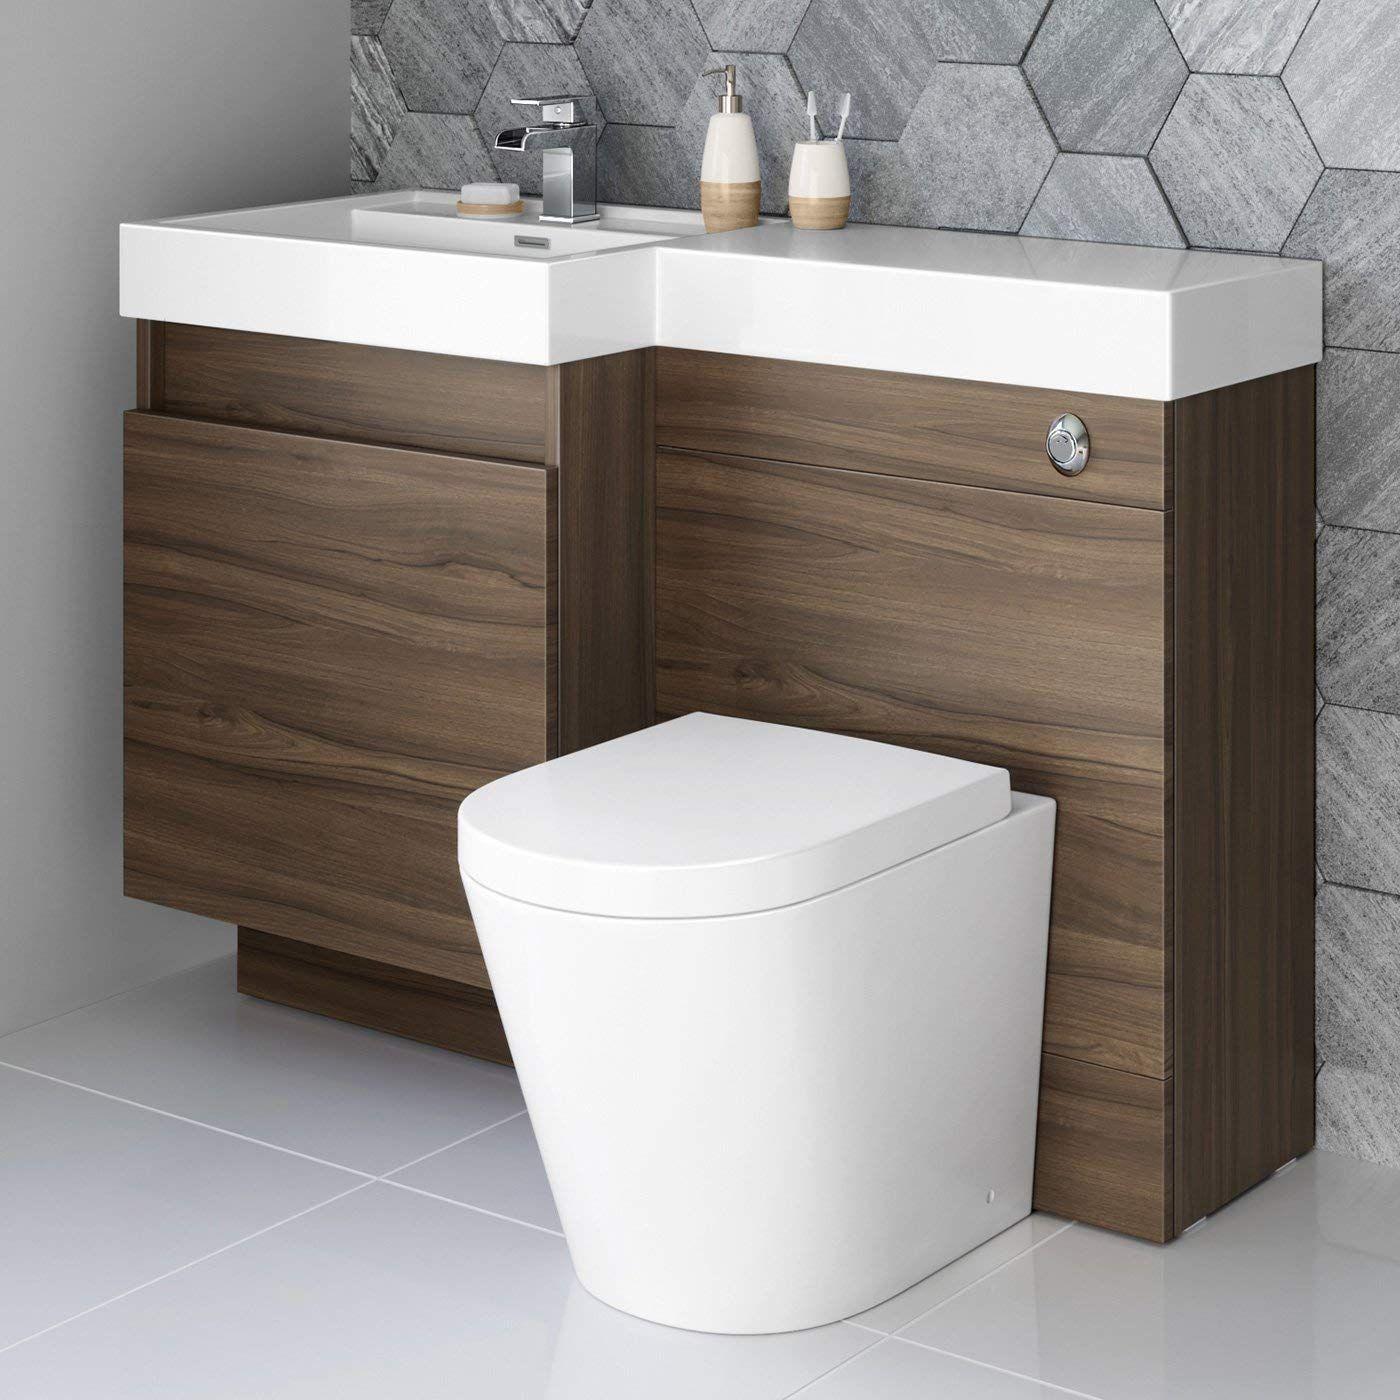 Vanity Unit Round Toilet Bathroom Sink